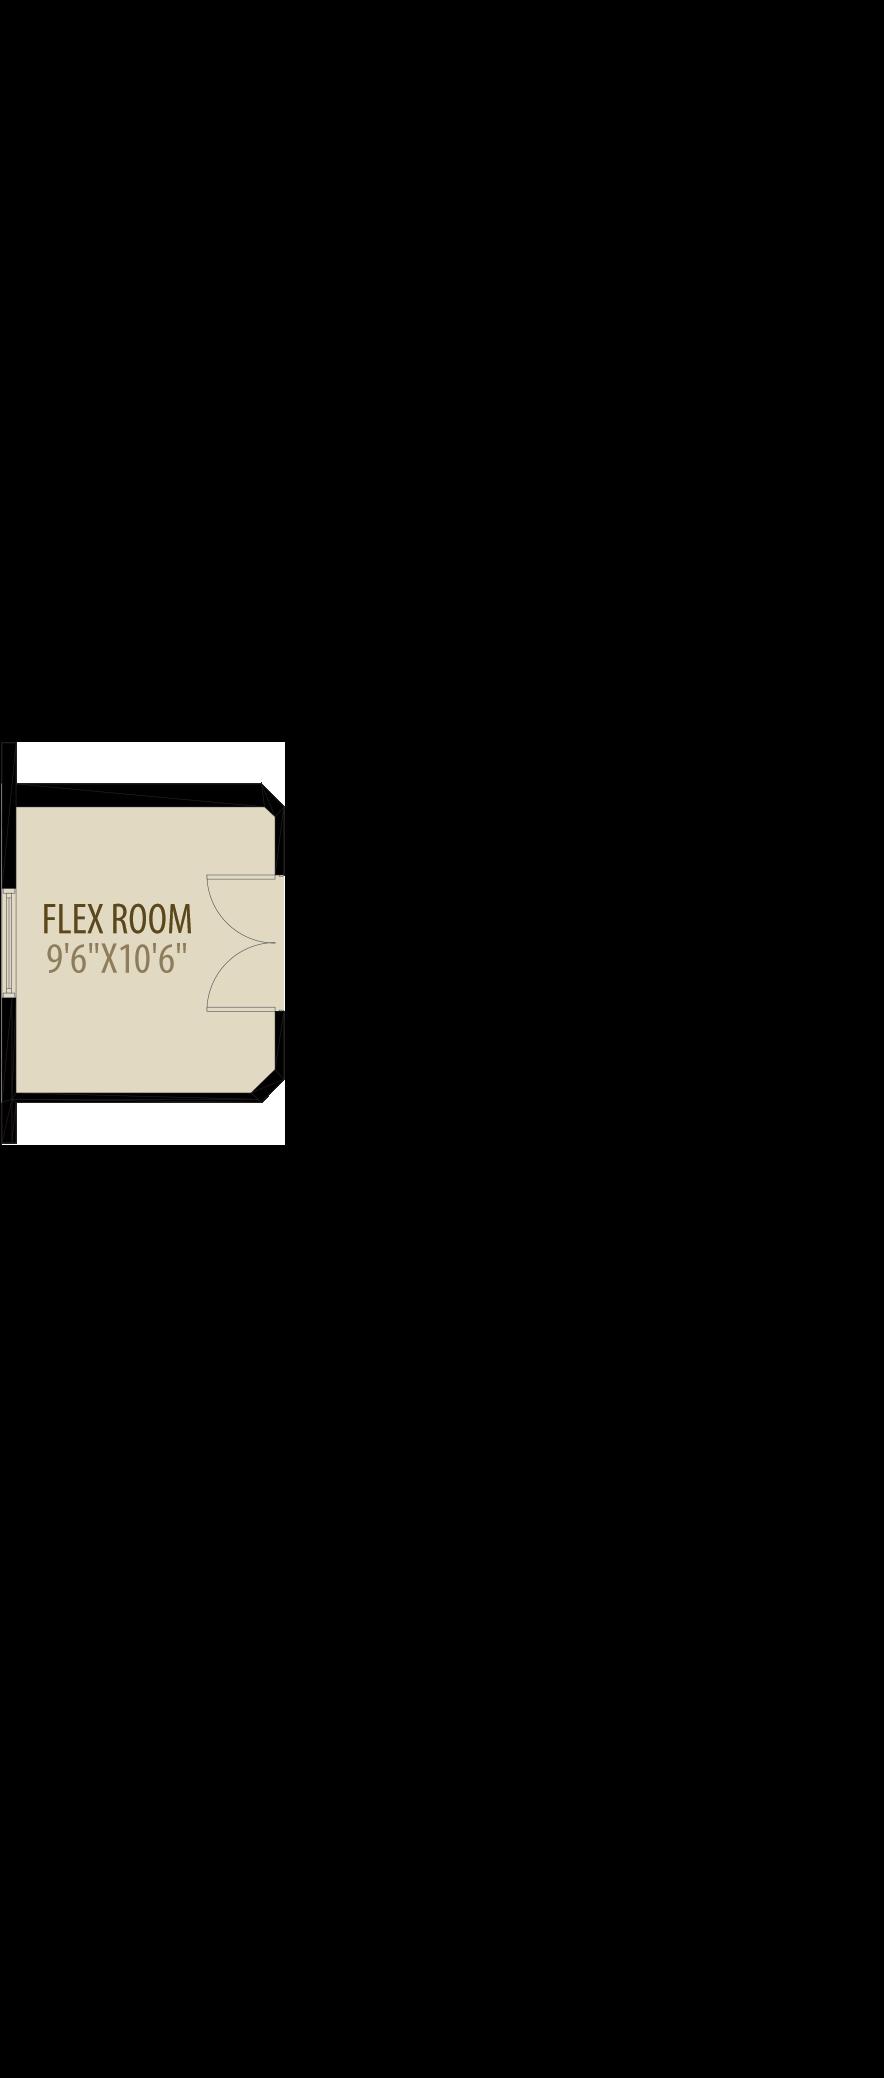 Enclsoed Flex Room